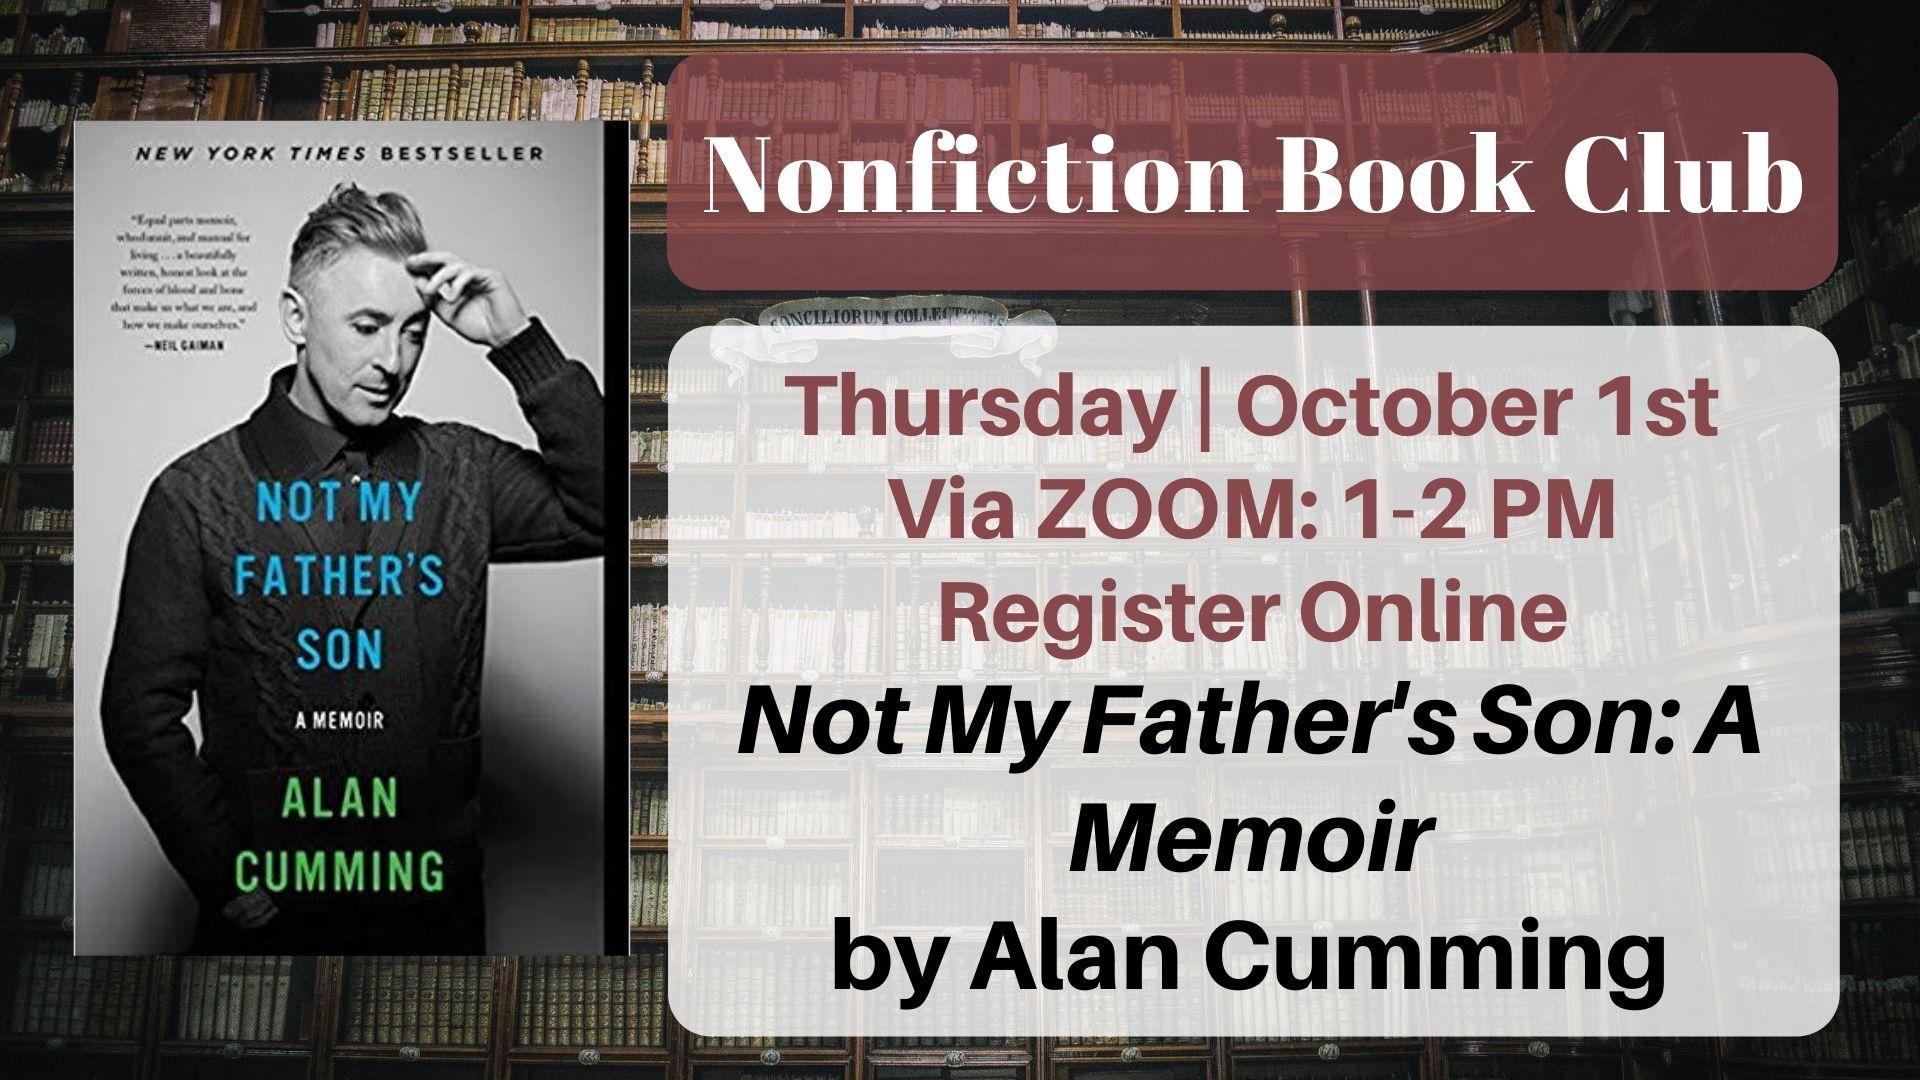 Nonfiction Book Club: Not My Father's Son: A Memoir by Alan Cumming